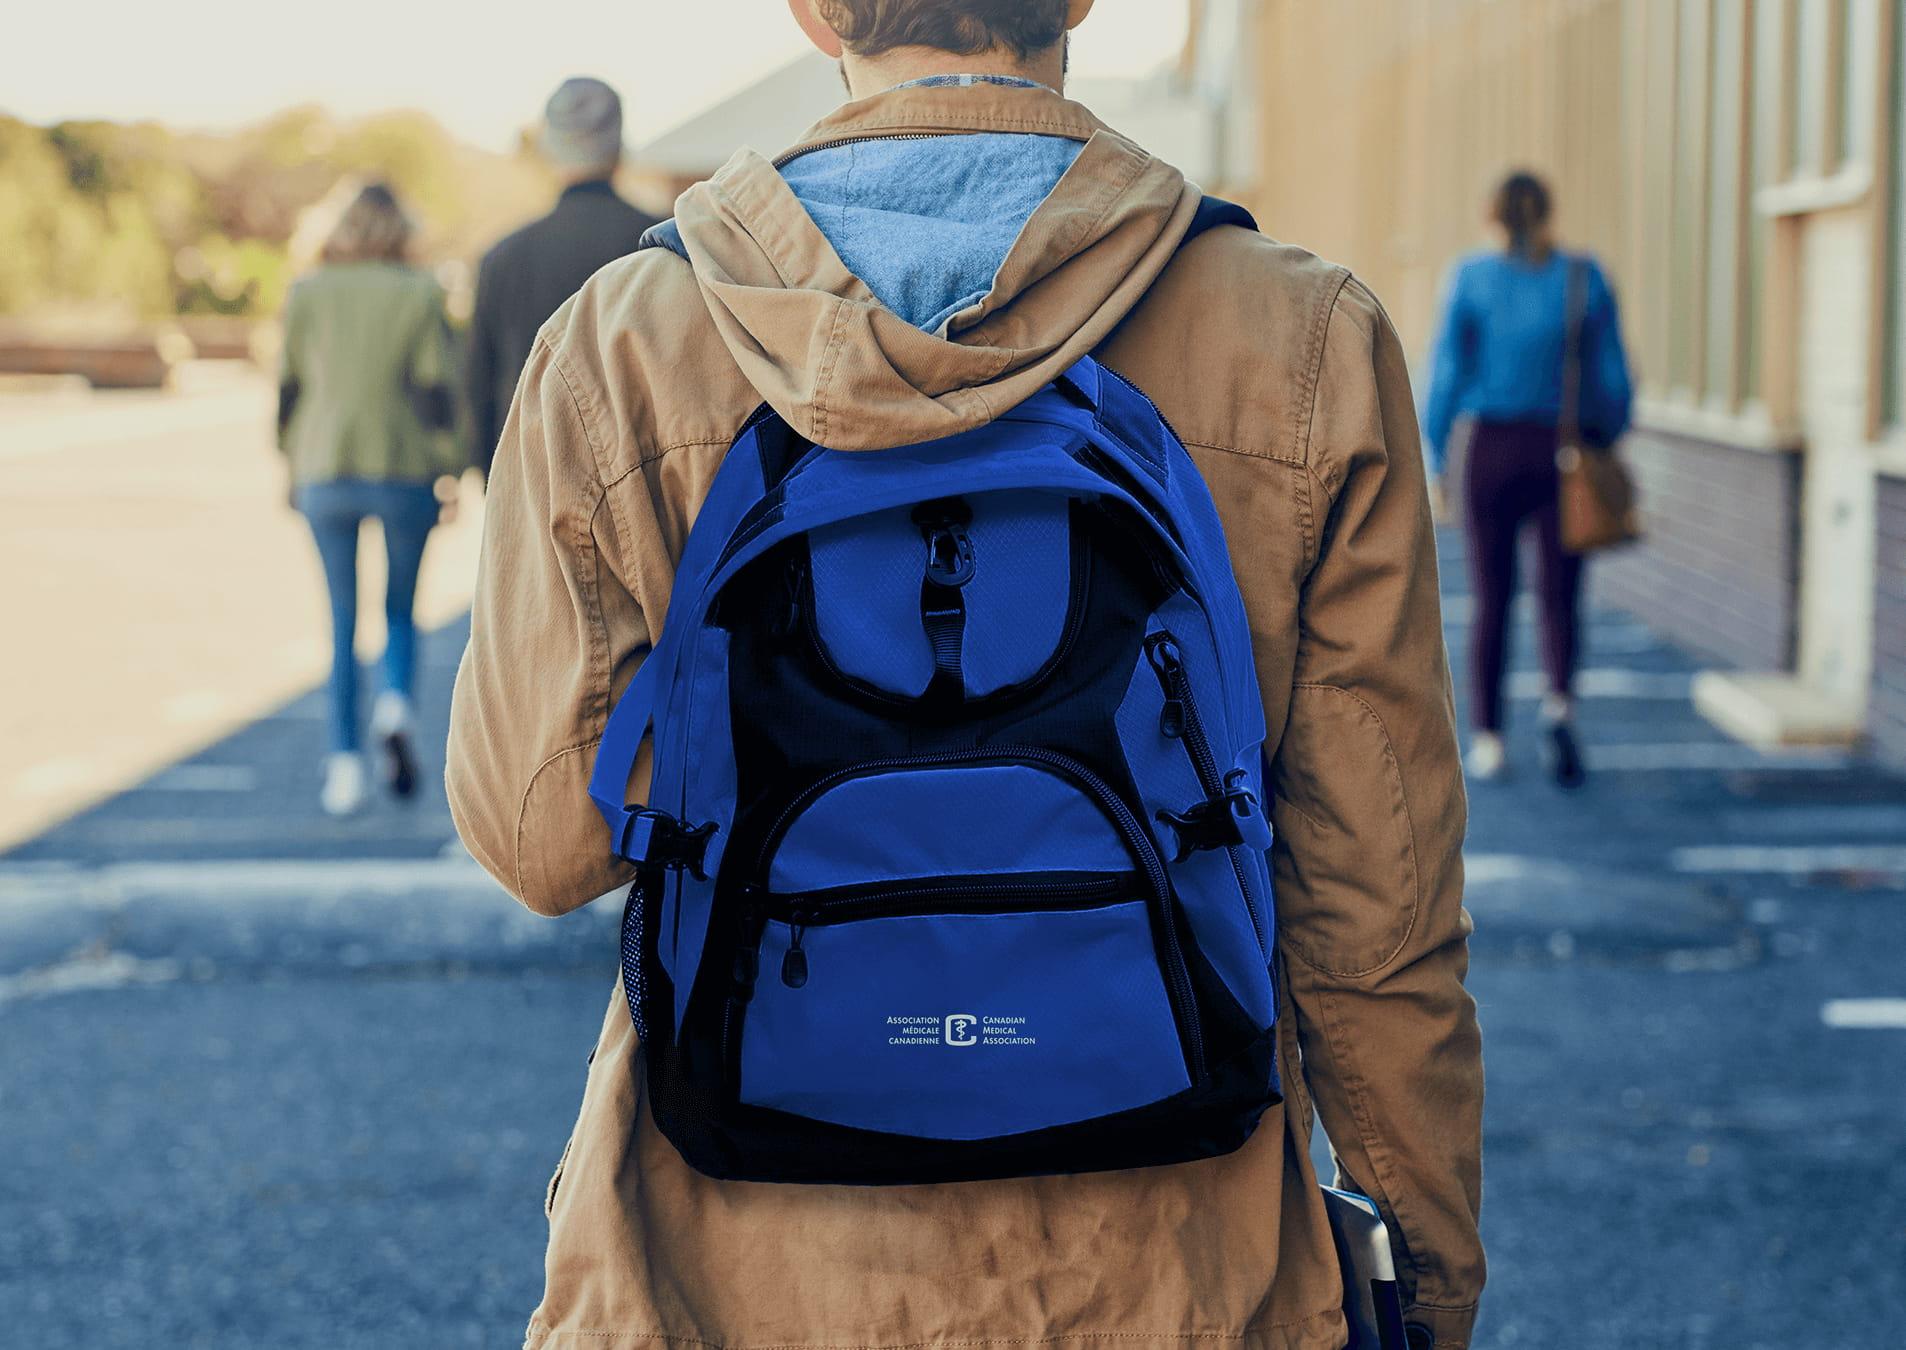 Medical student wearing a Canadian Medical Association backpack